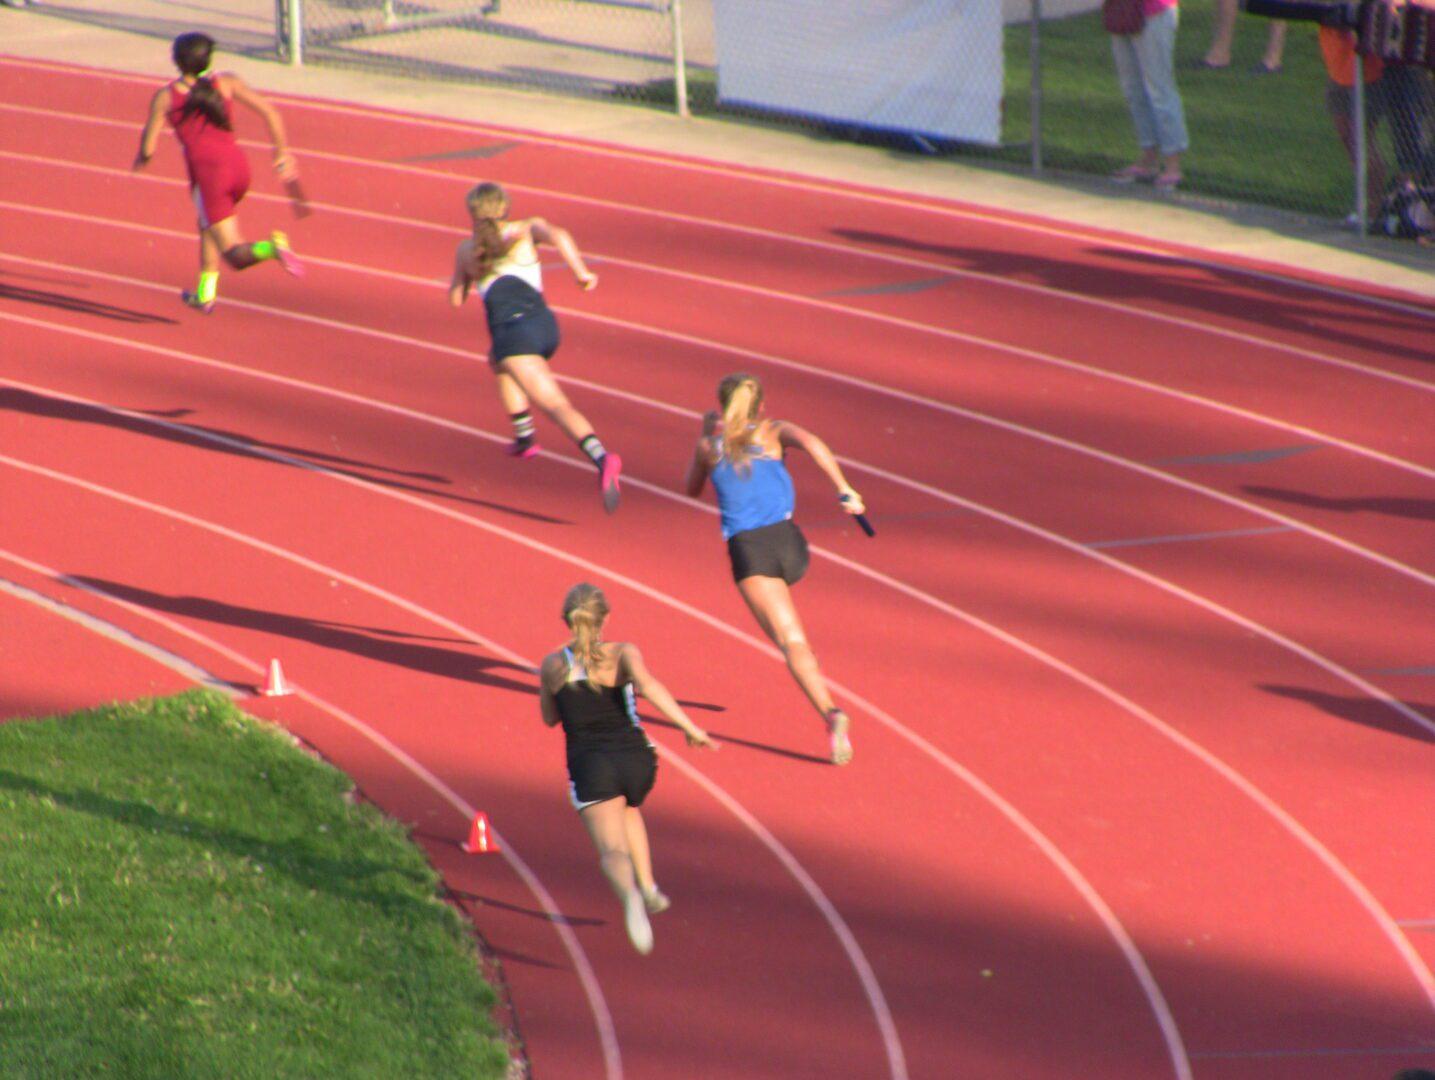 Big names have big performances at annual West Michigan All-Star track meet (VIDEO)